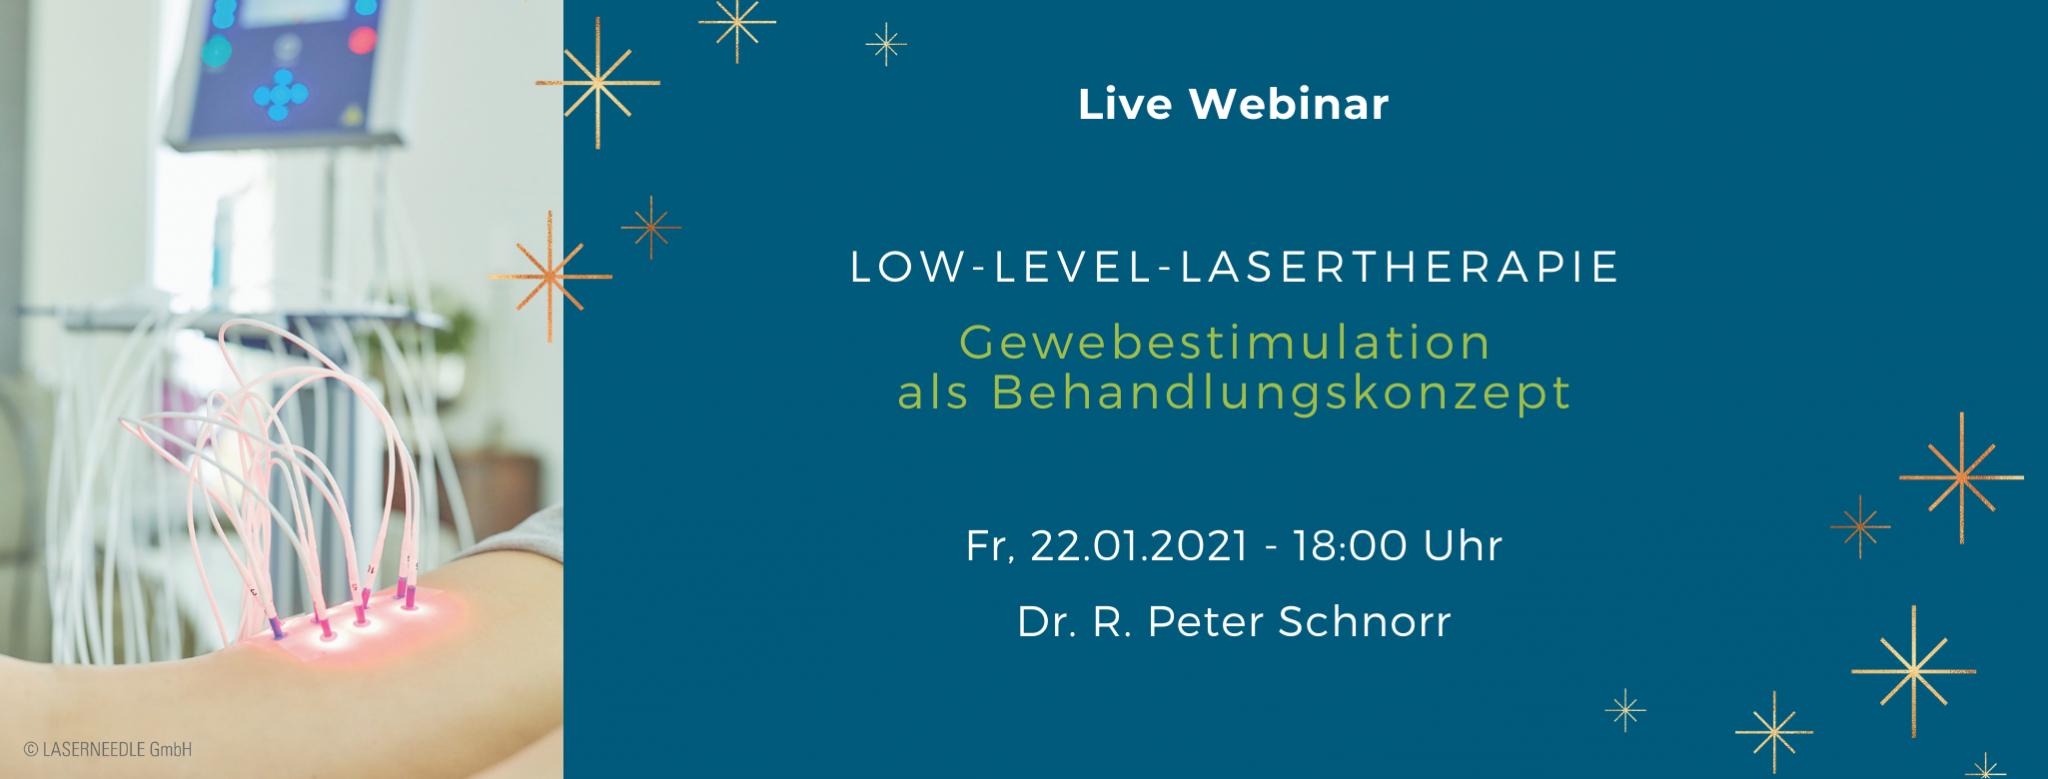 Low-Level-Lasertherapie, Laserneedle, Webinar, Dr. Schnorr, PEROmed